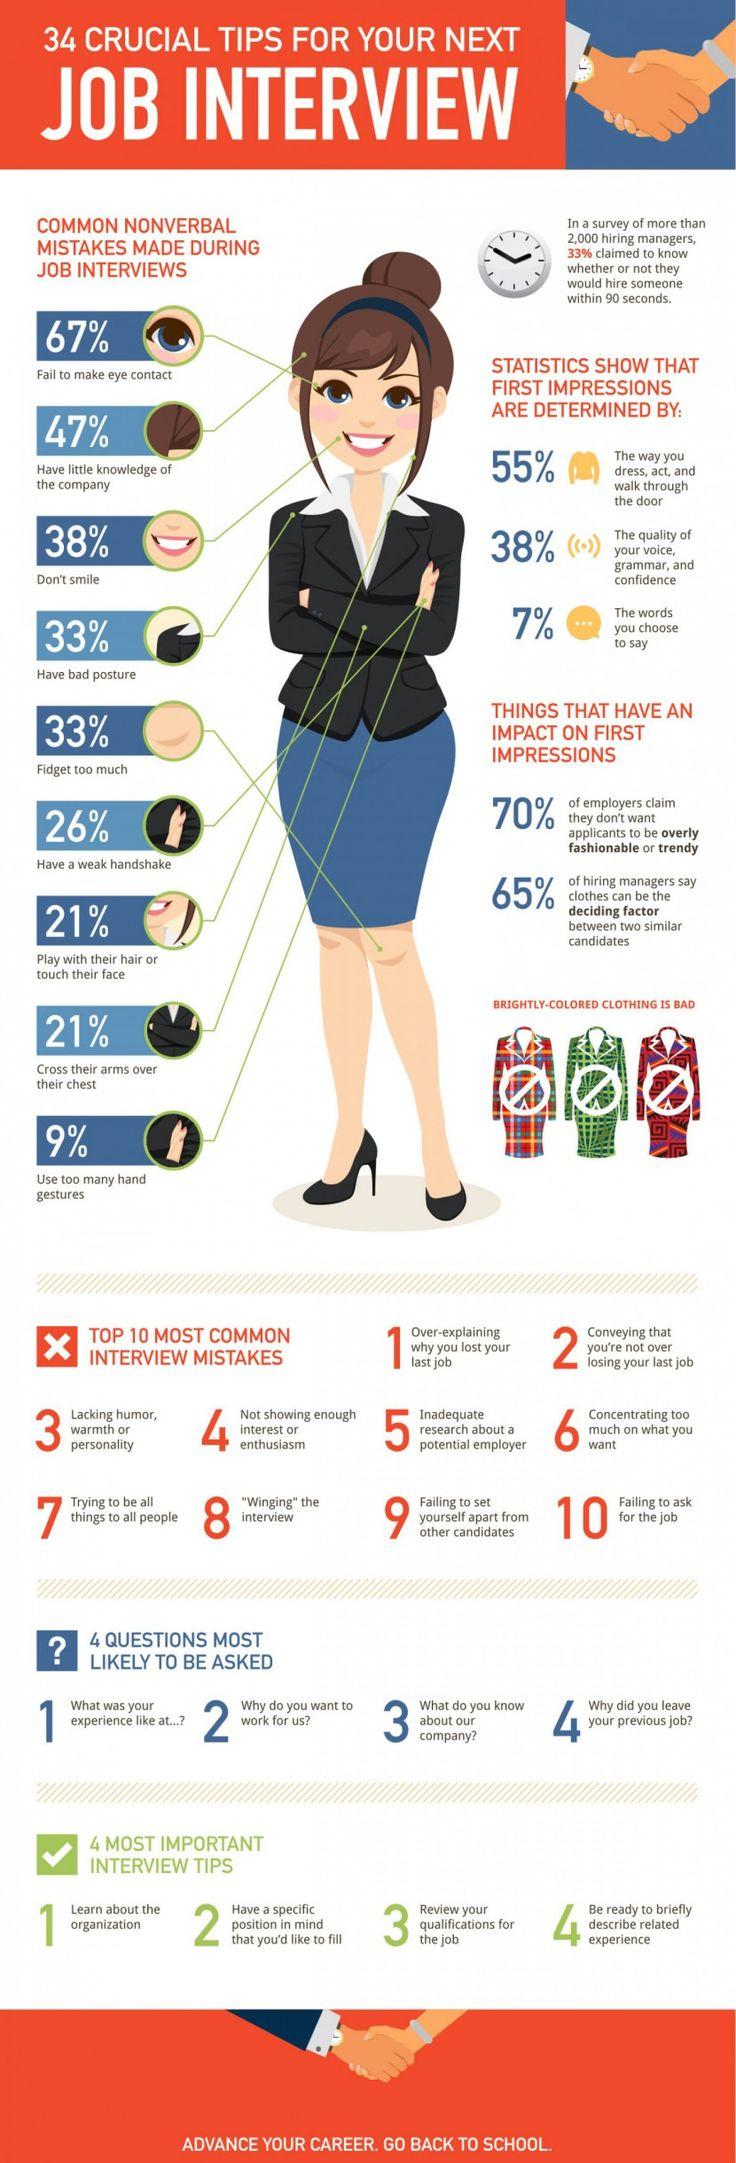 tips-for-success-job-interviews